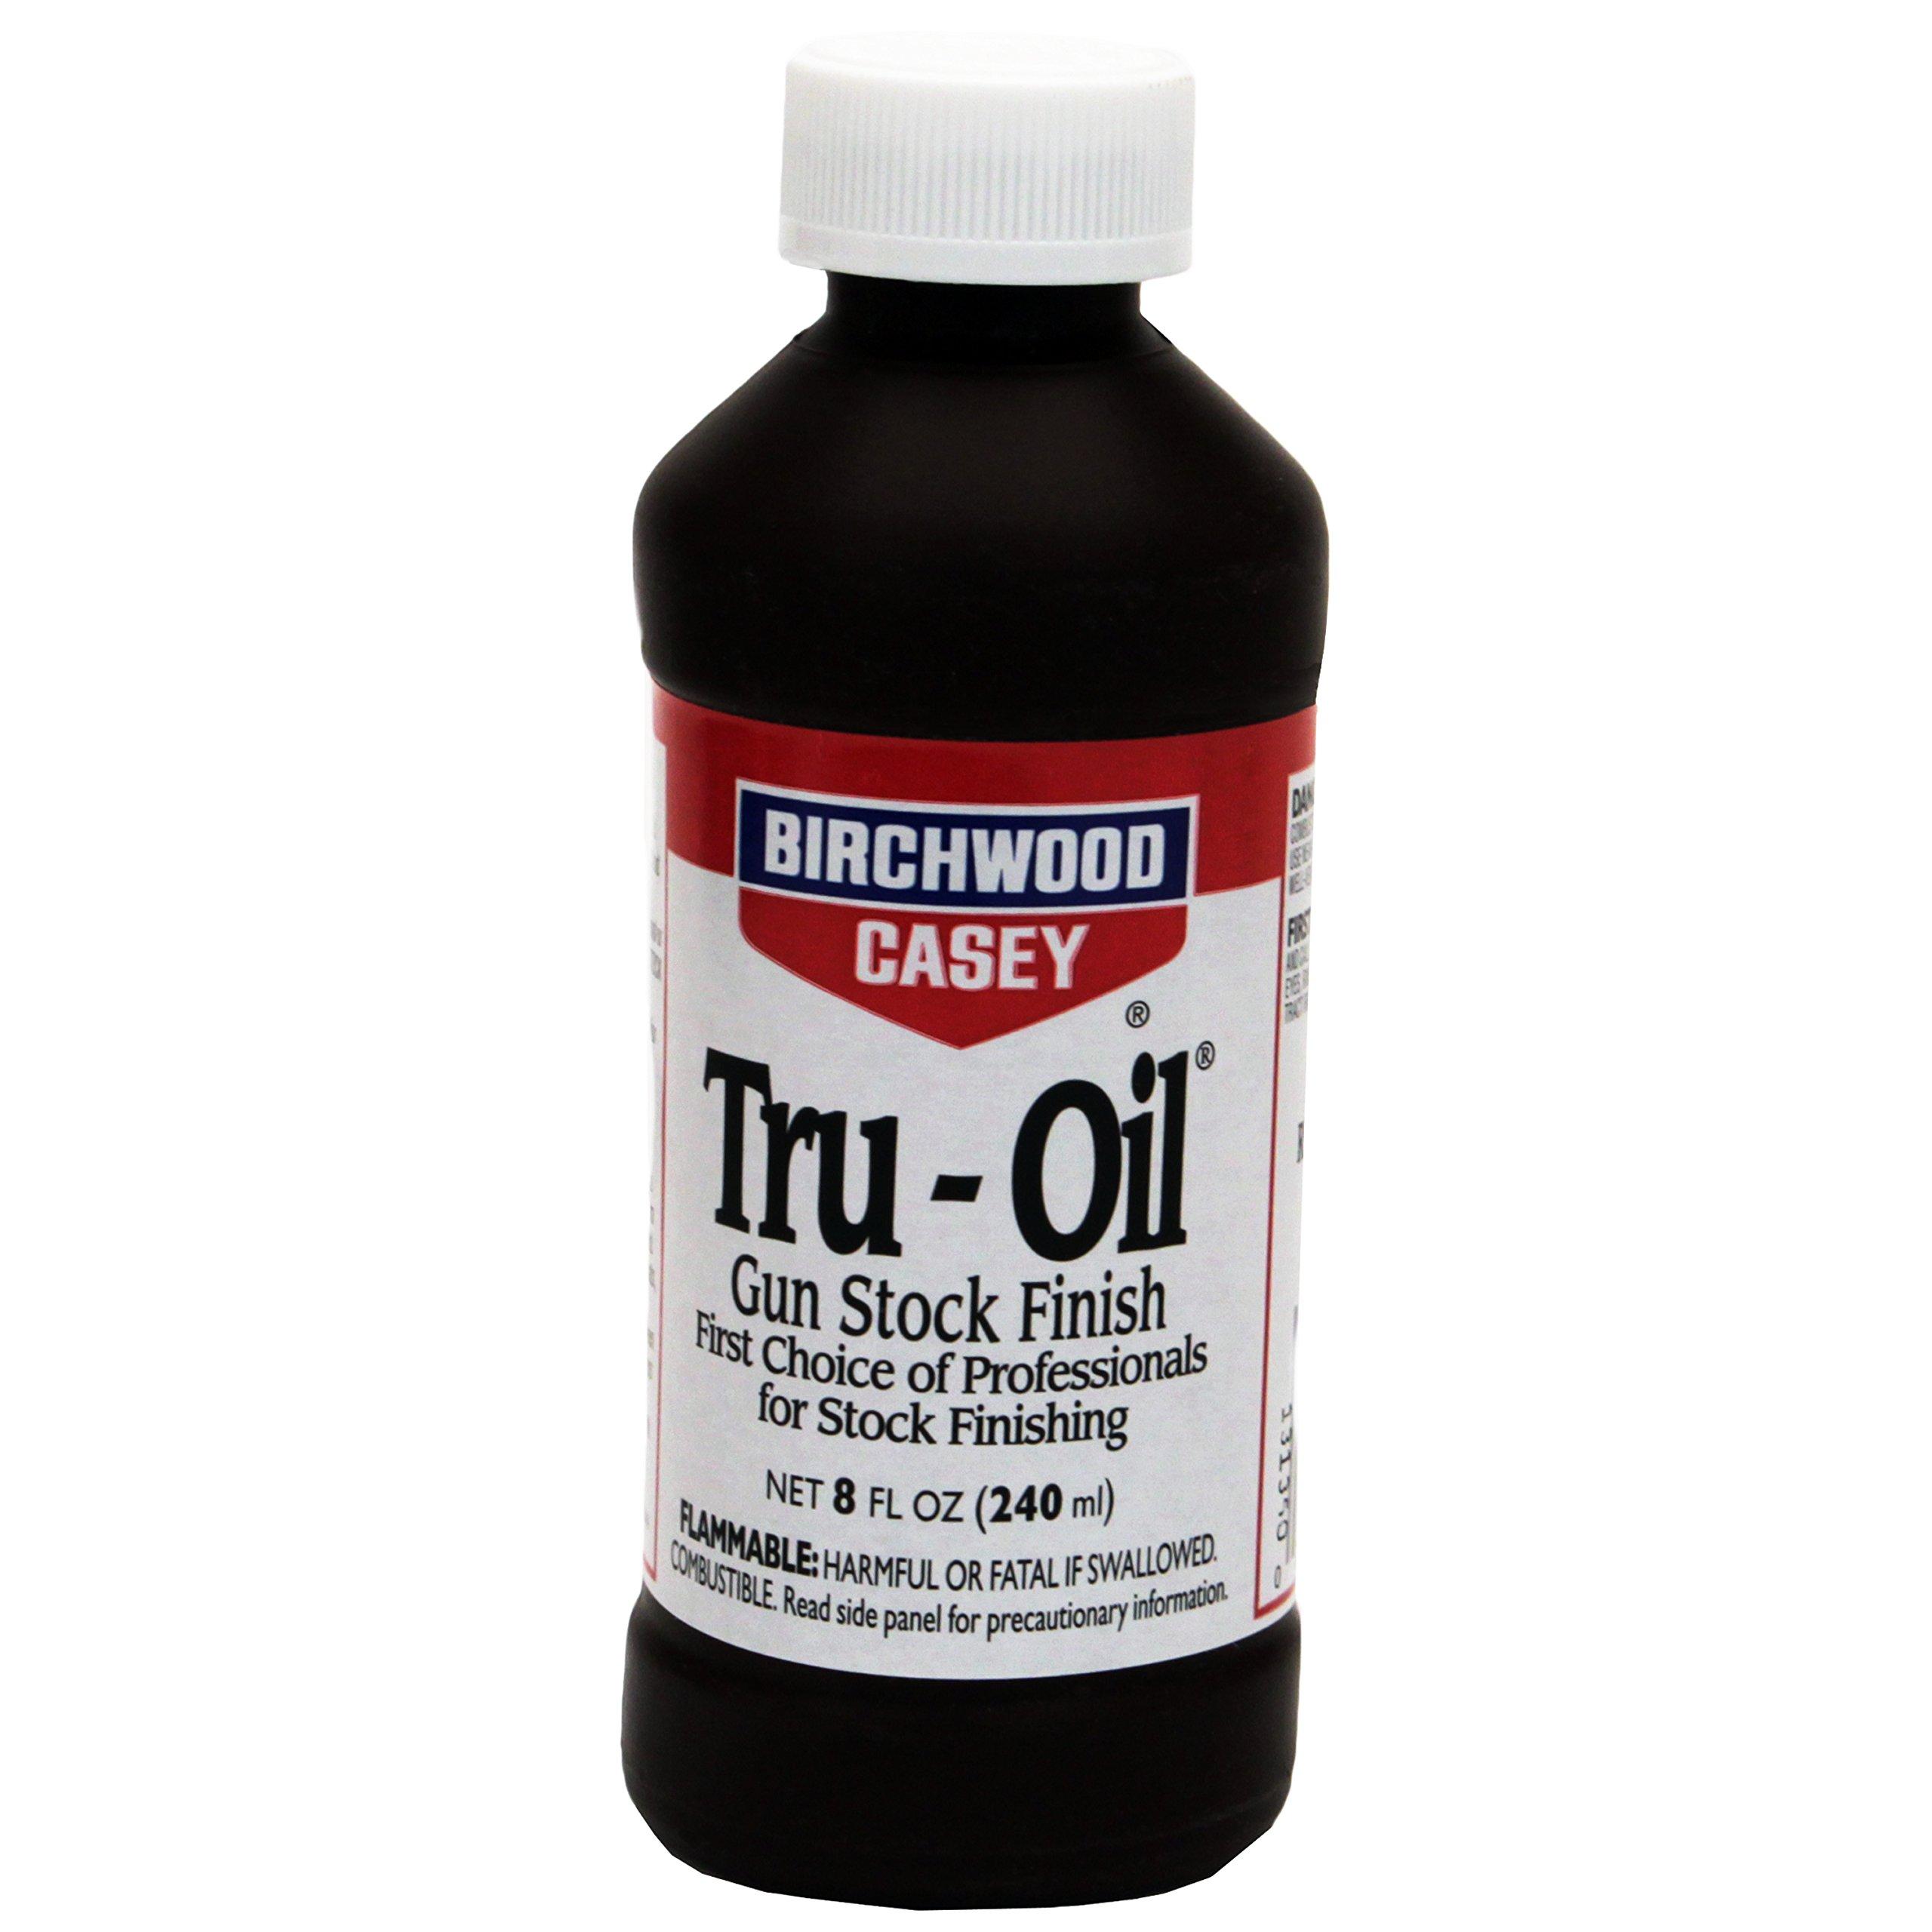 Tru-Oil Gun Stock Finish 8oz. Birchwood Casey 23035